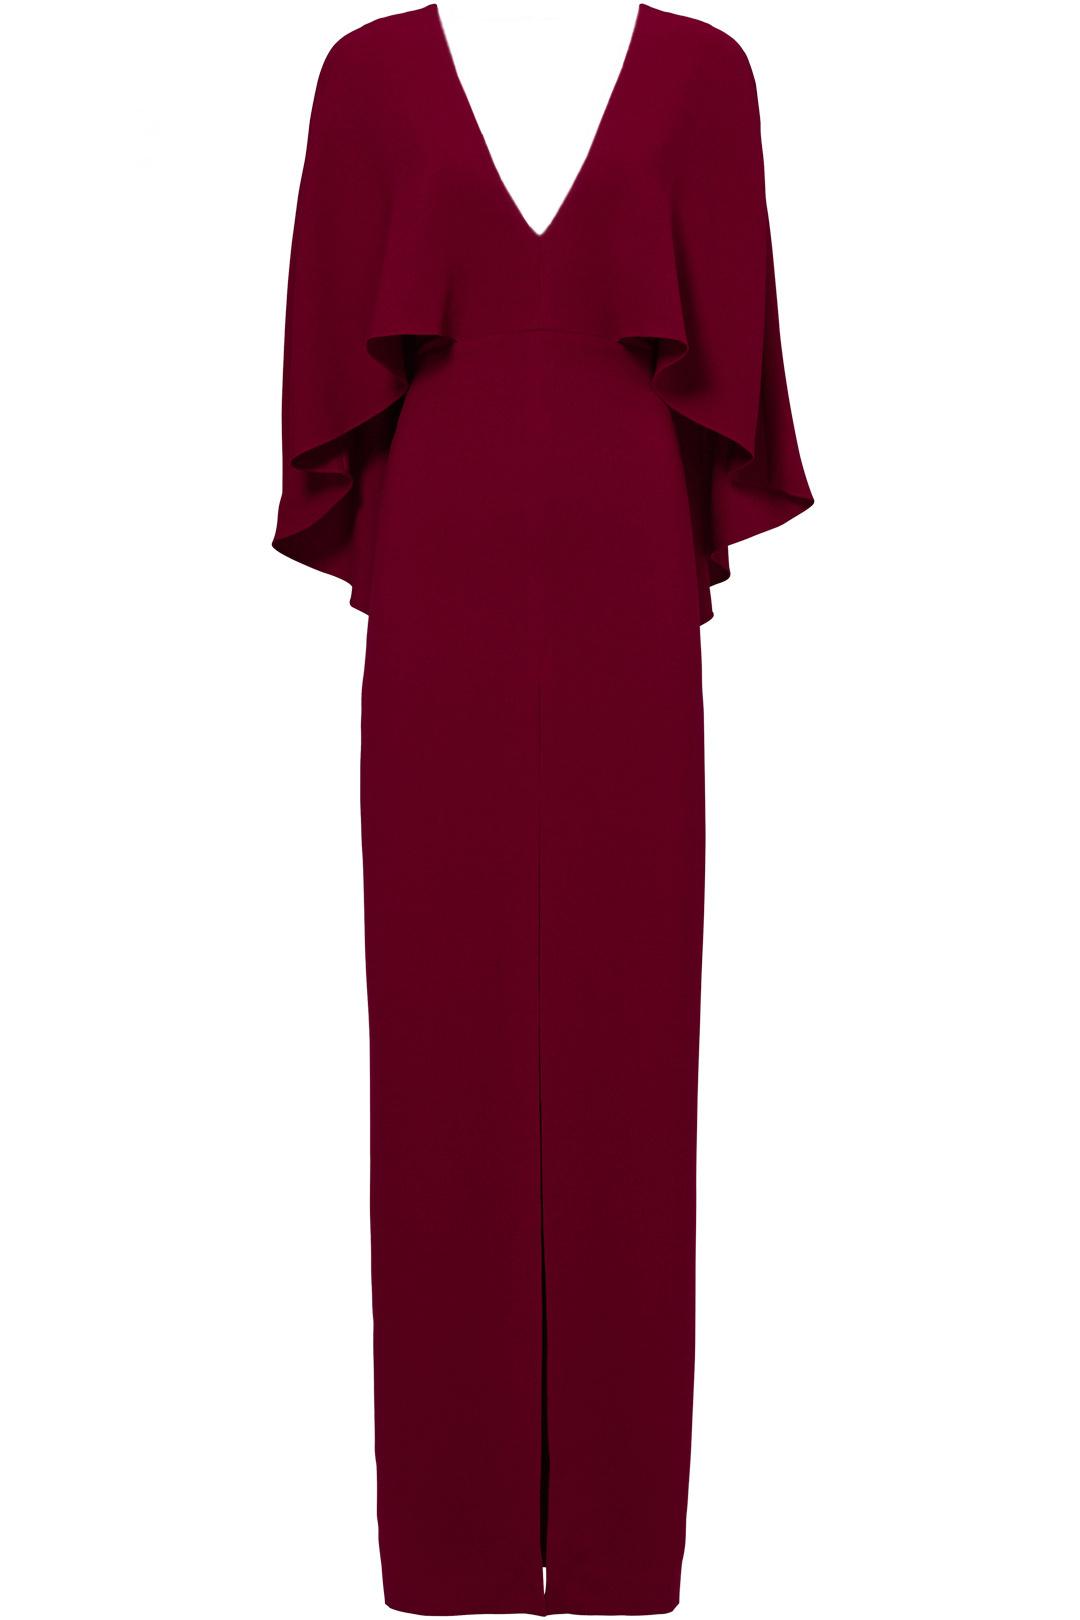 halston heritage dahlia cape gown - $70.00-$80.00